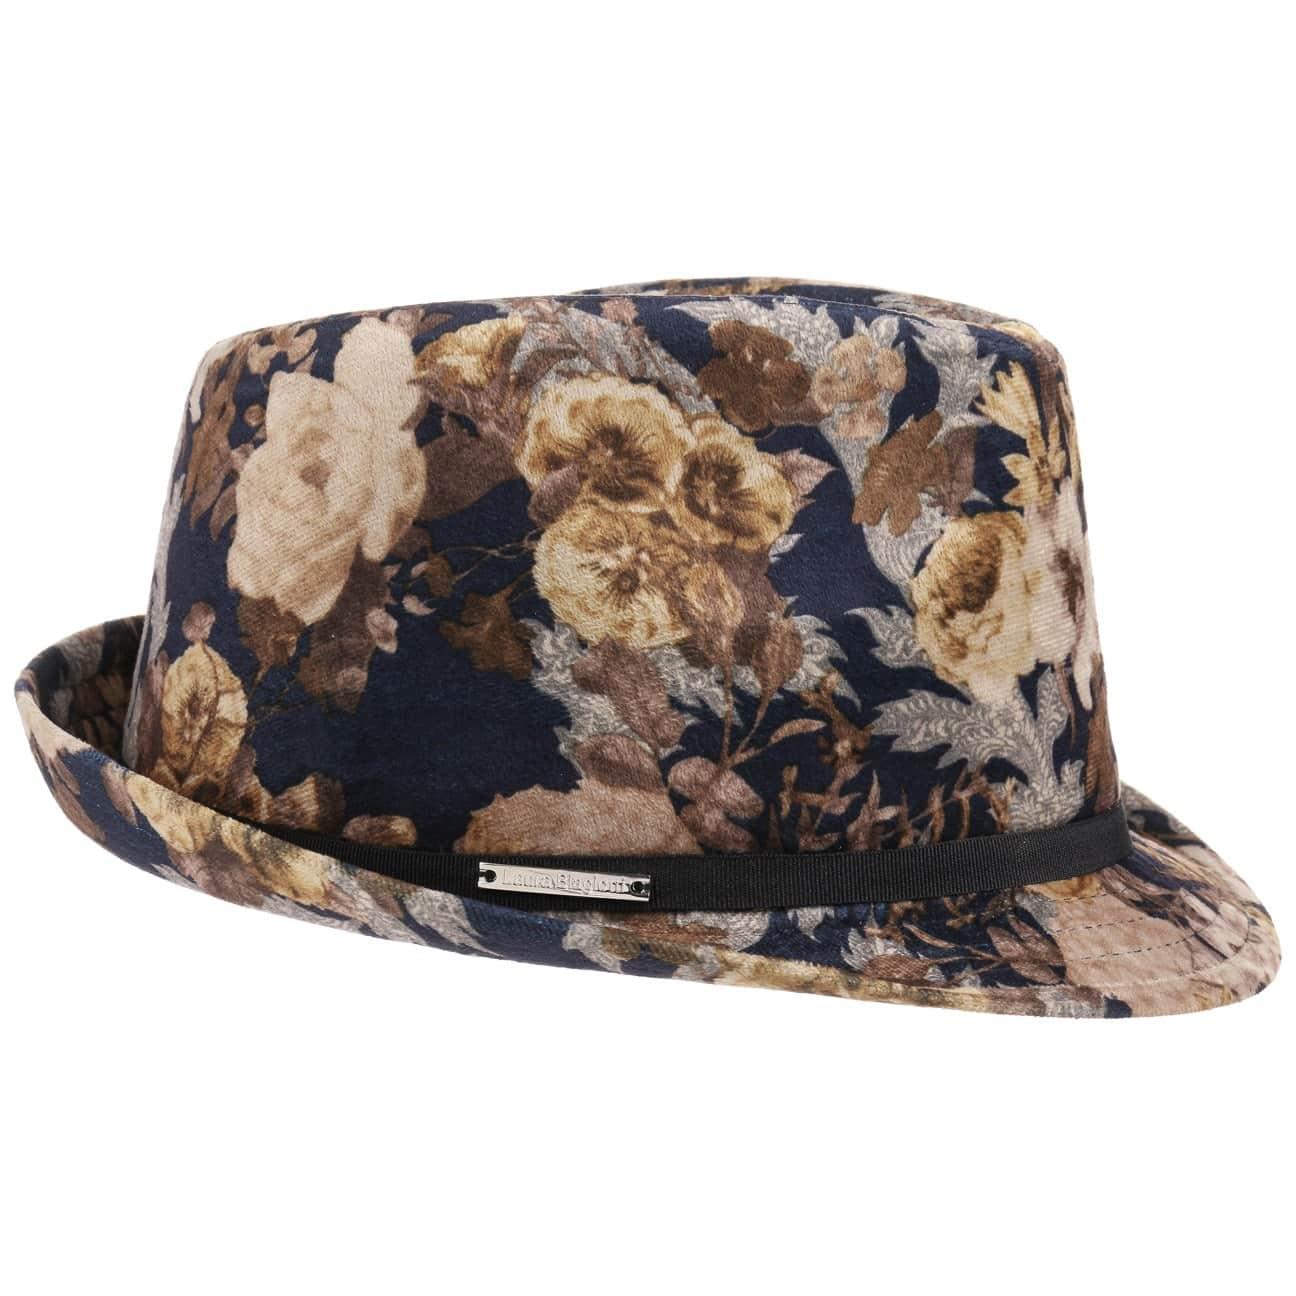 Sombrero Baroque Trilby by Laura Biagiotti  sombrero de mujer